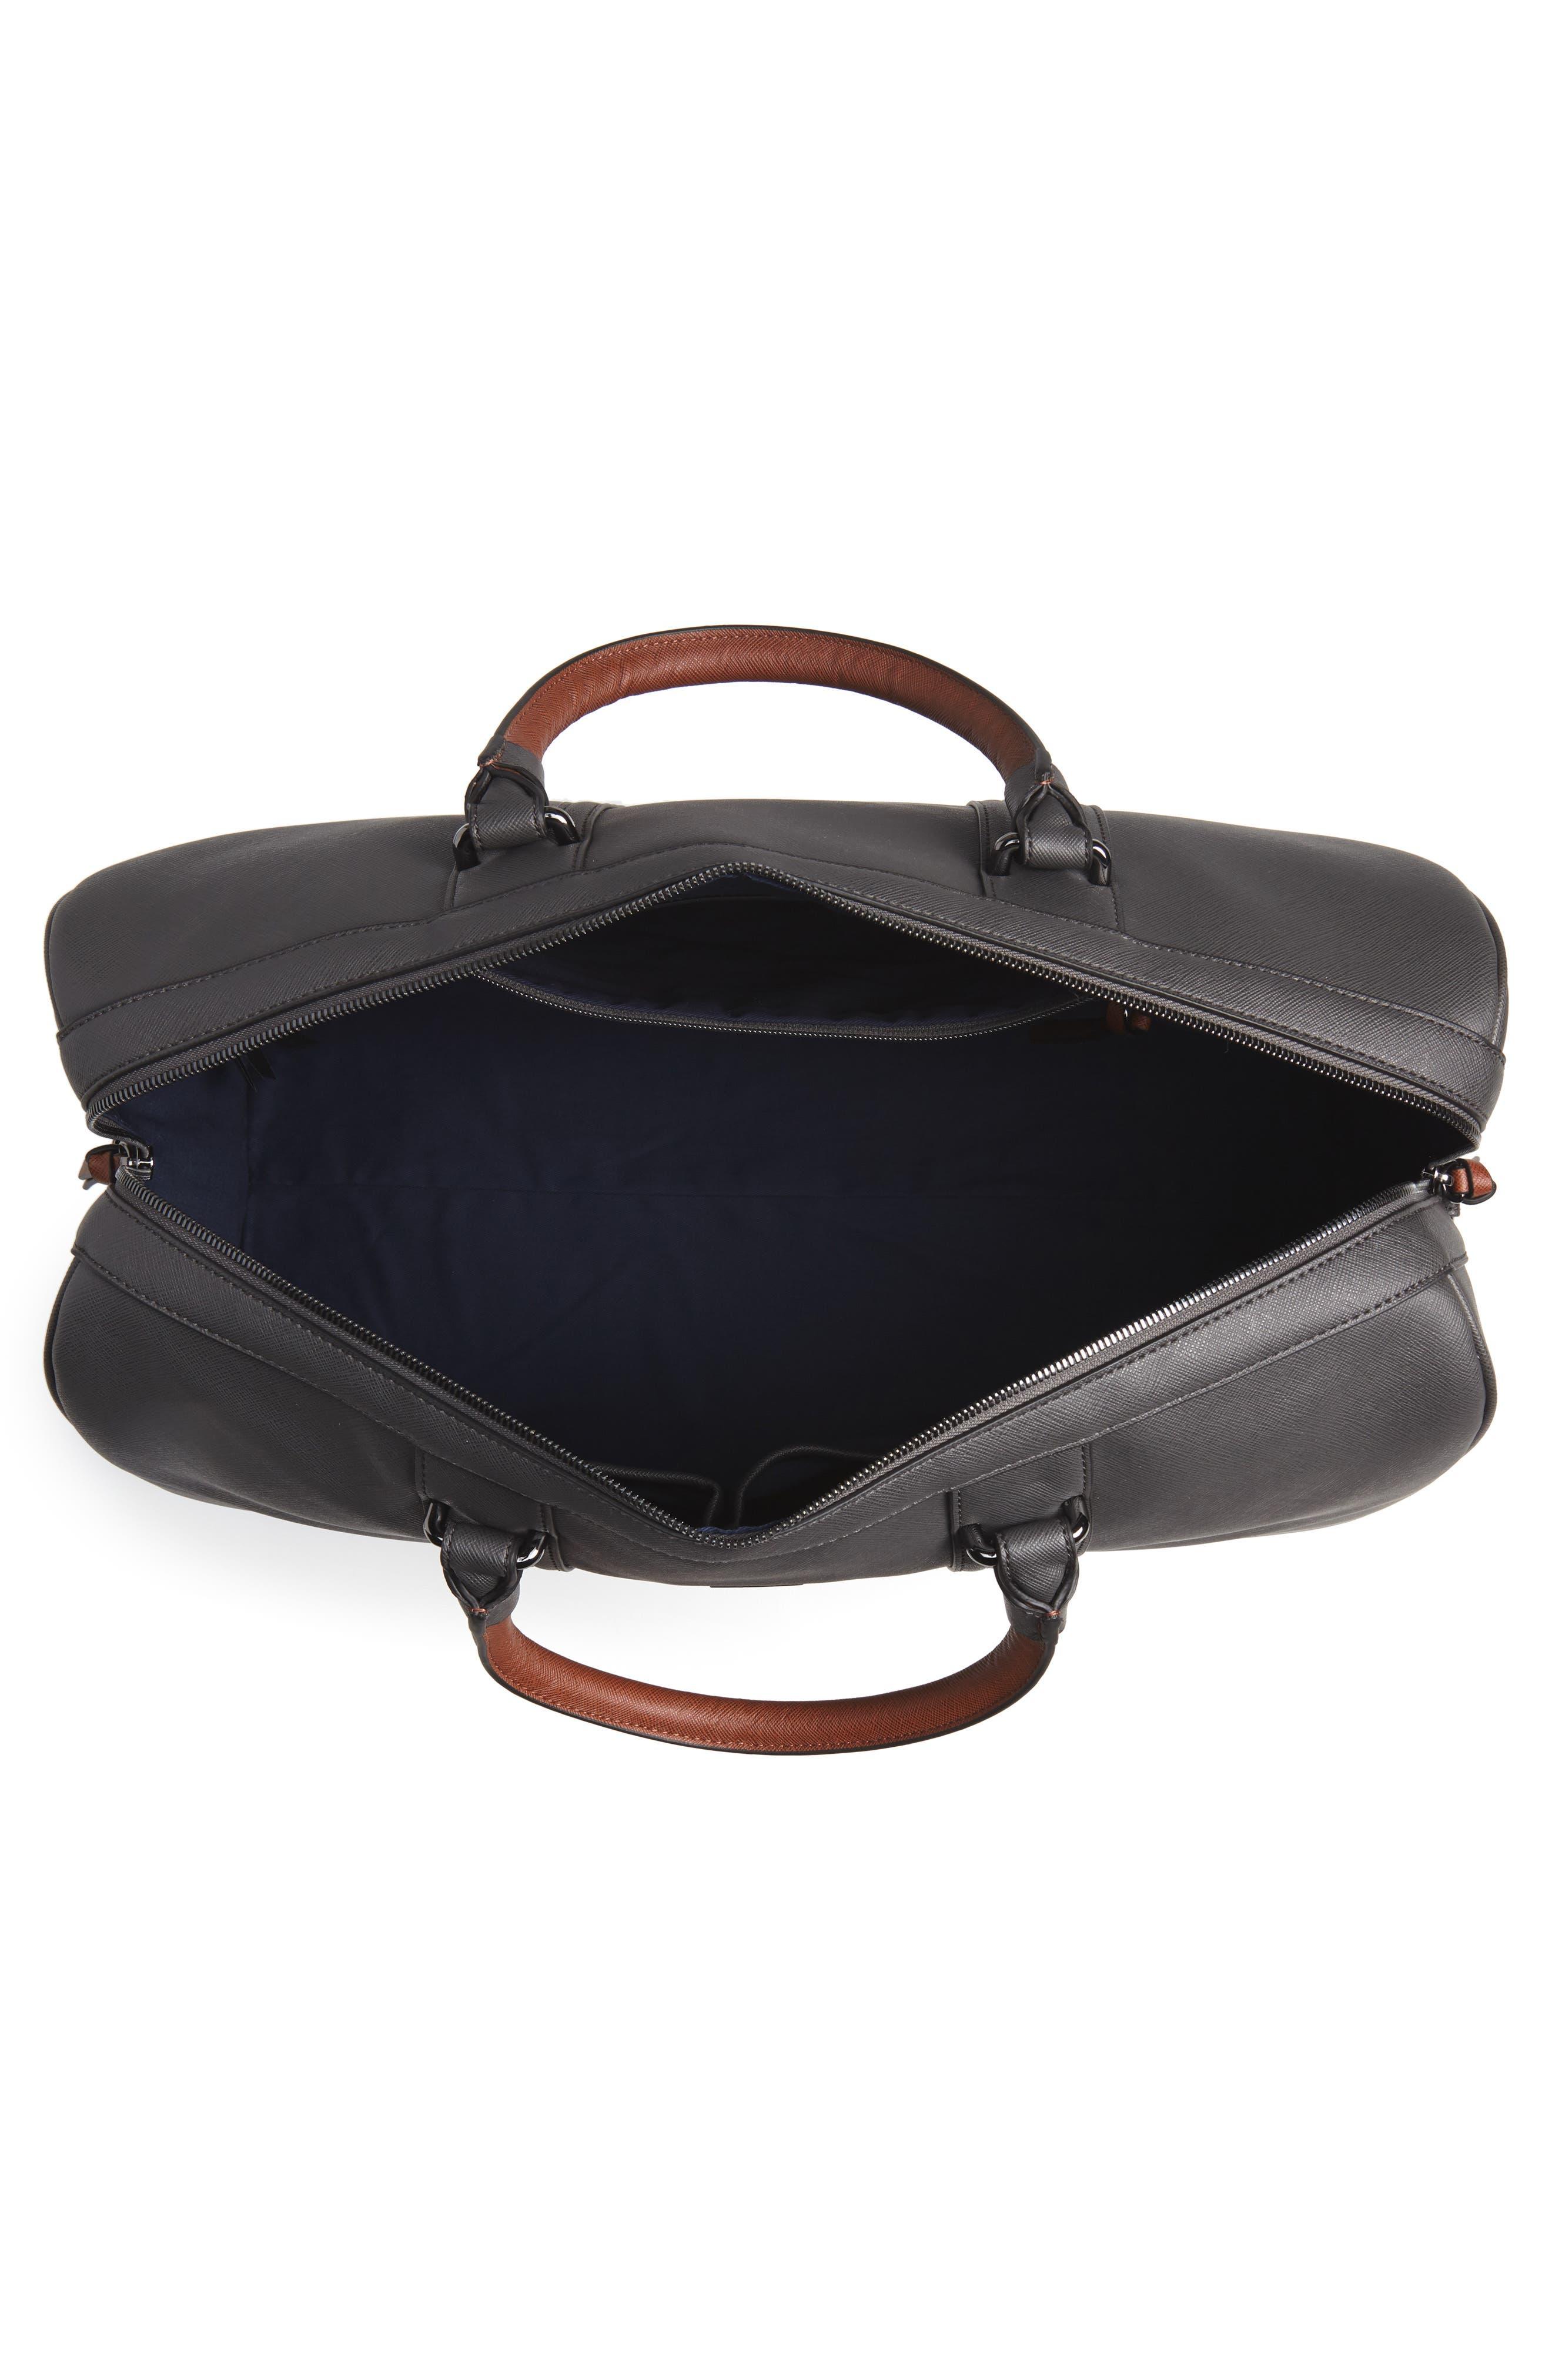 TED BAKER LONDON, Grankan Faux Leather Duffel Bag, Alternate thumbnail 4, color, 020